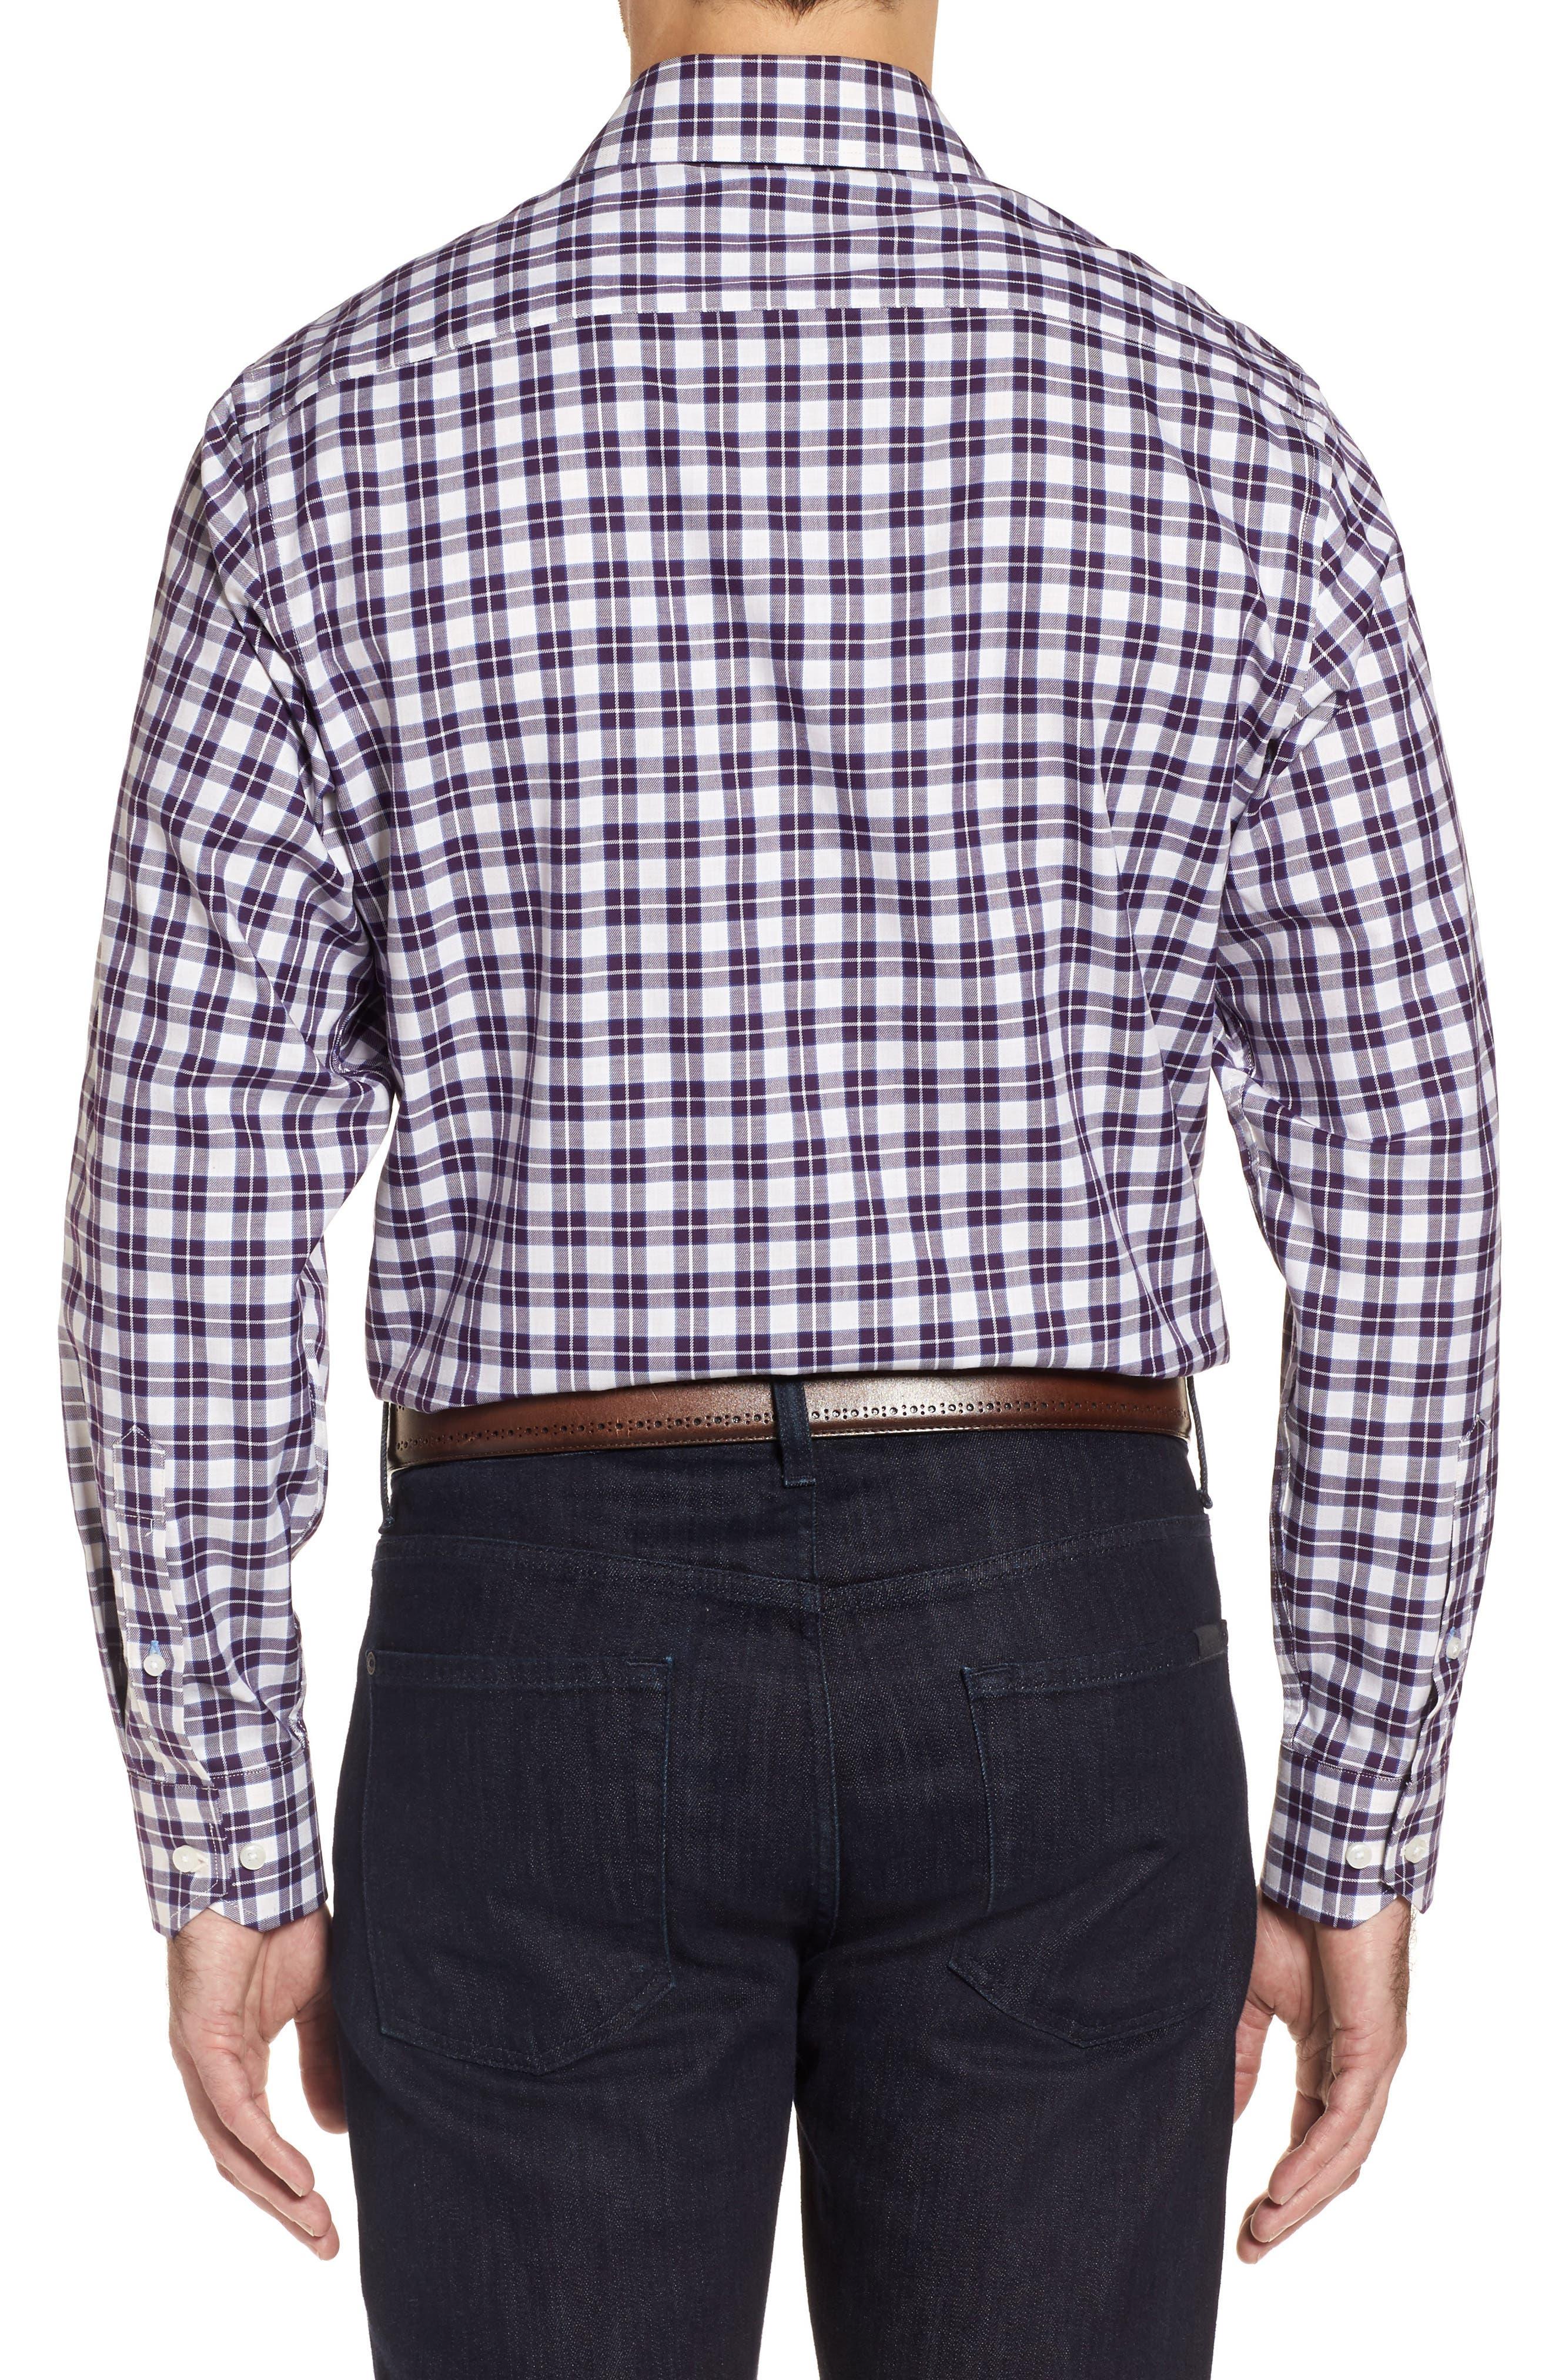 Cameron Regular Fit Plaid Sport Shirt,                             Alternate thumbnail 2, color,                             Purple